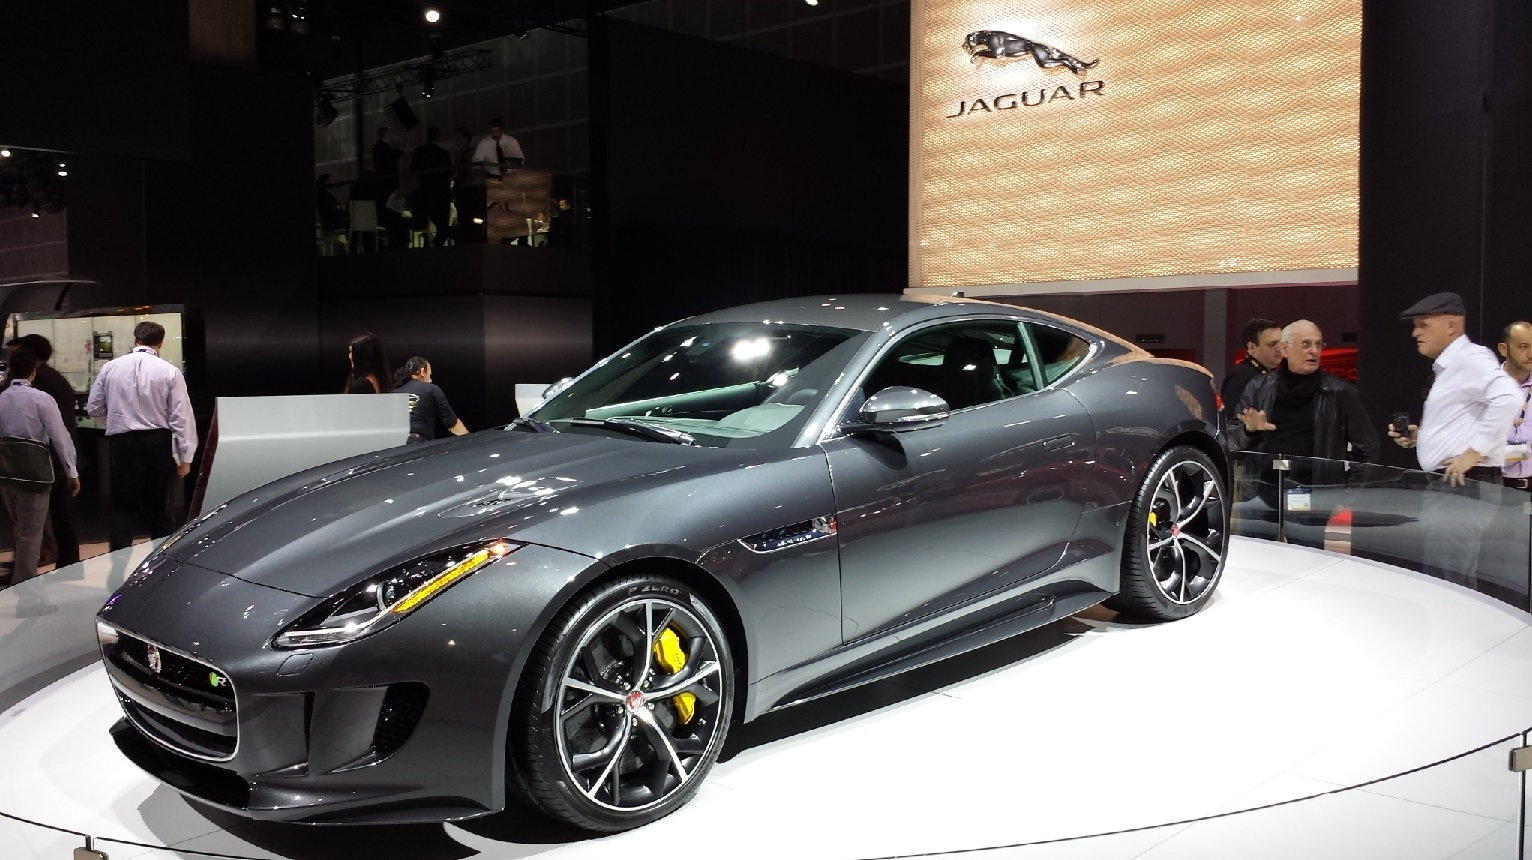 2016 jaguar f type styles features highlights. Black Bedroom Furniture Sets. Home Design Ideas